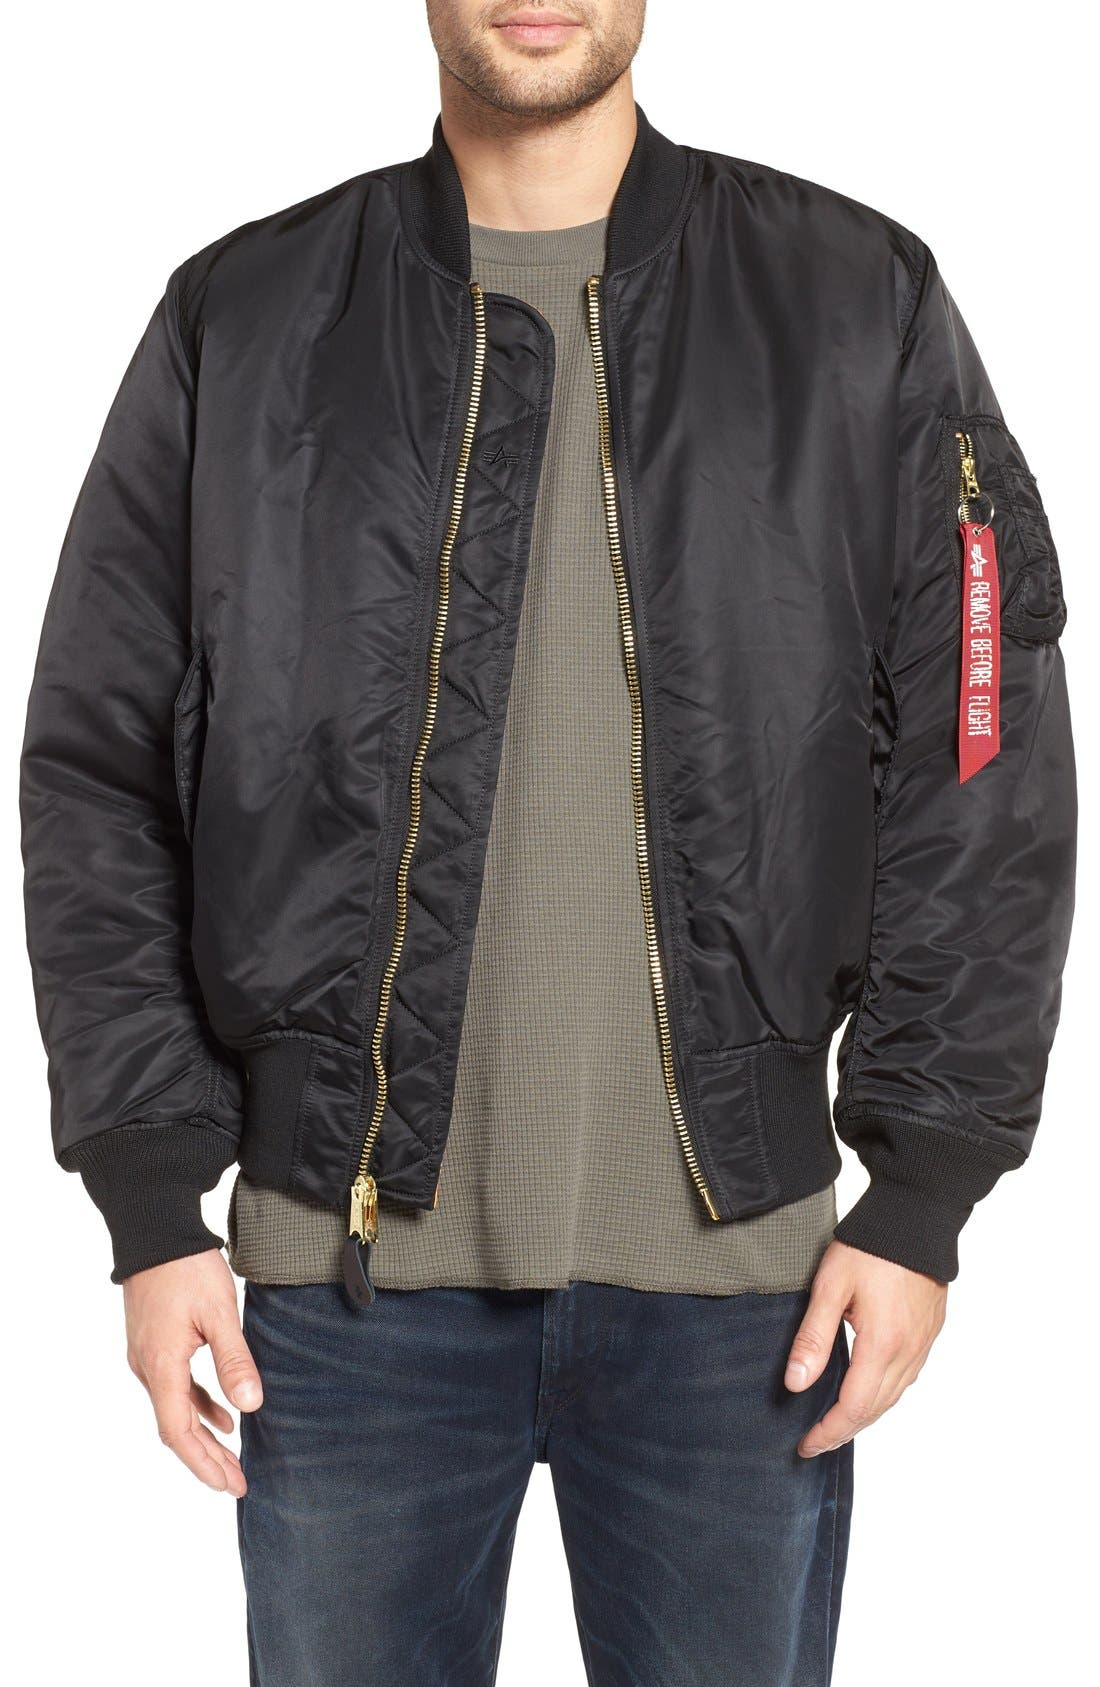 'MA-1' Slim Fit Bomber Jacket,                             Main thumbnail 1, color,                             BLACK